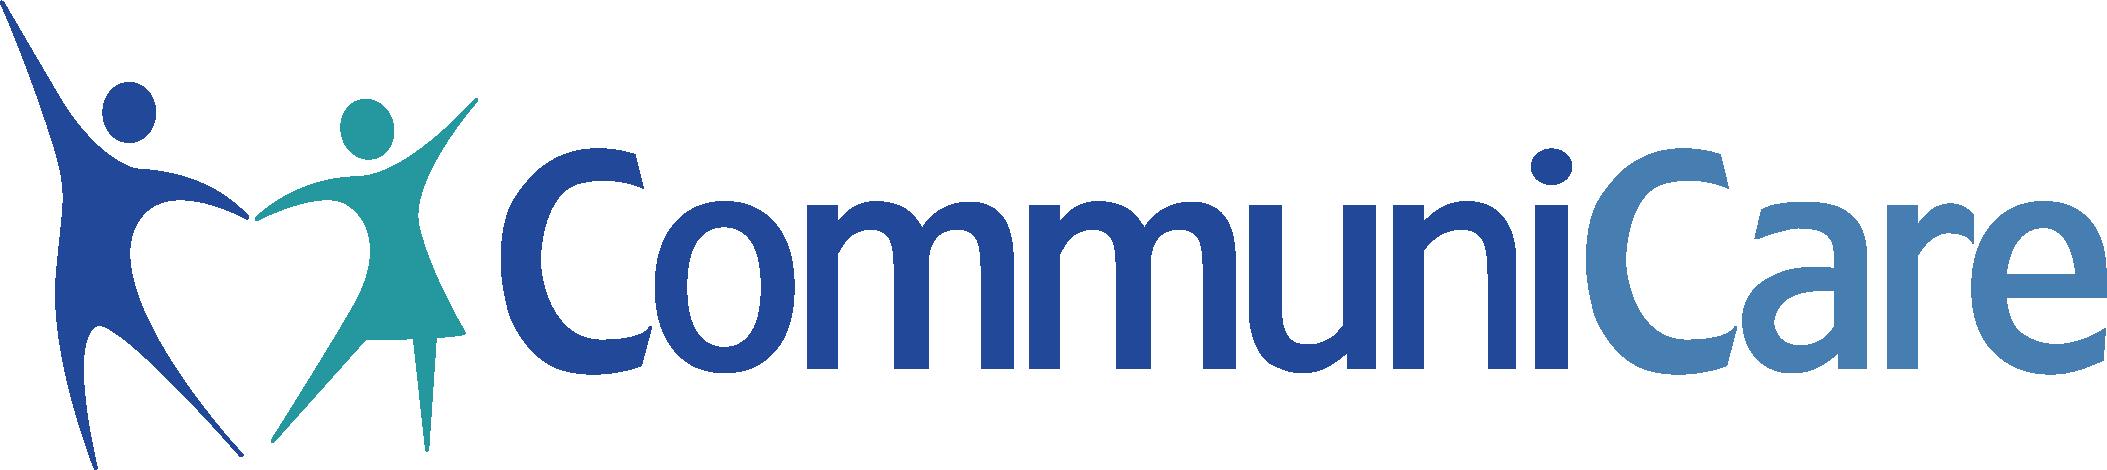 Communicare Health Center logo